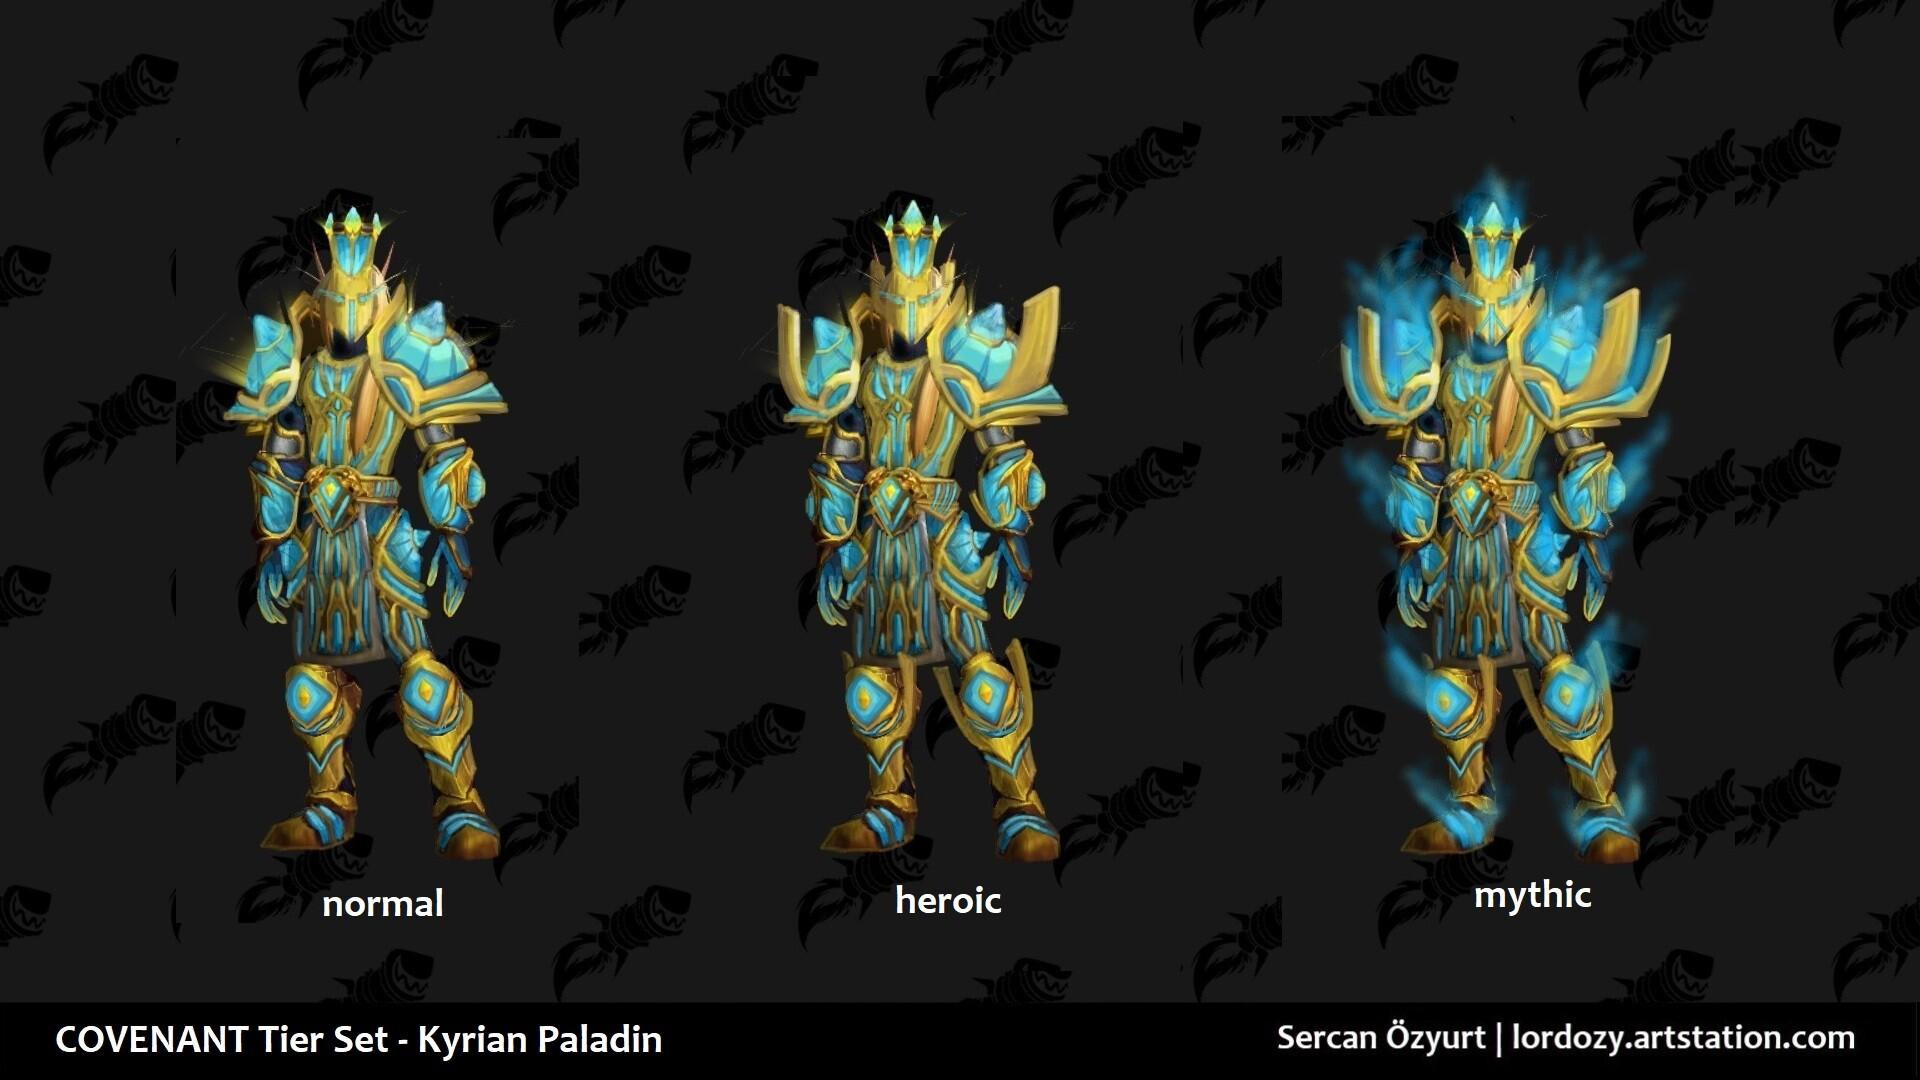 sercan-ozyurt-ascension-gear-level.jpg?1